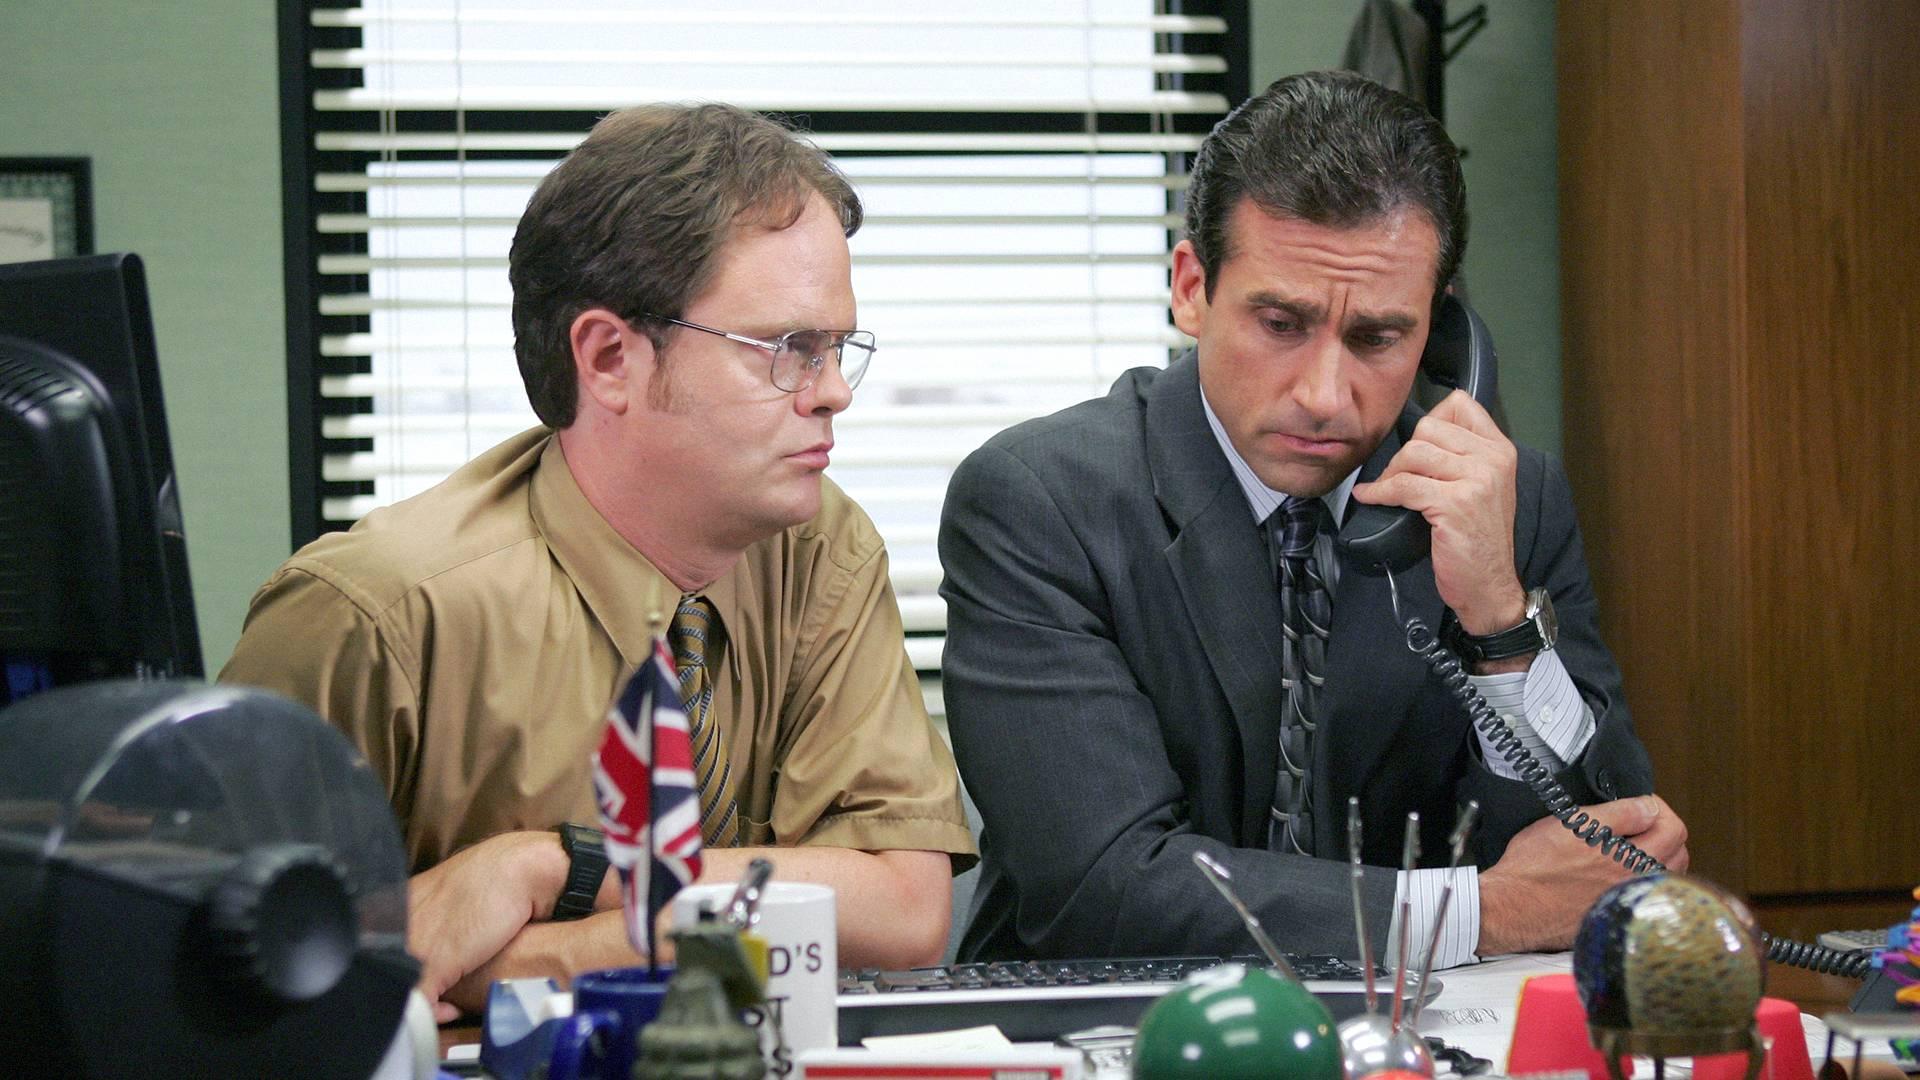 The Office Season 3 Episode 1